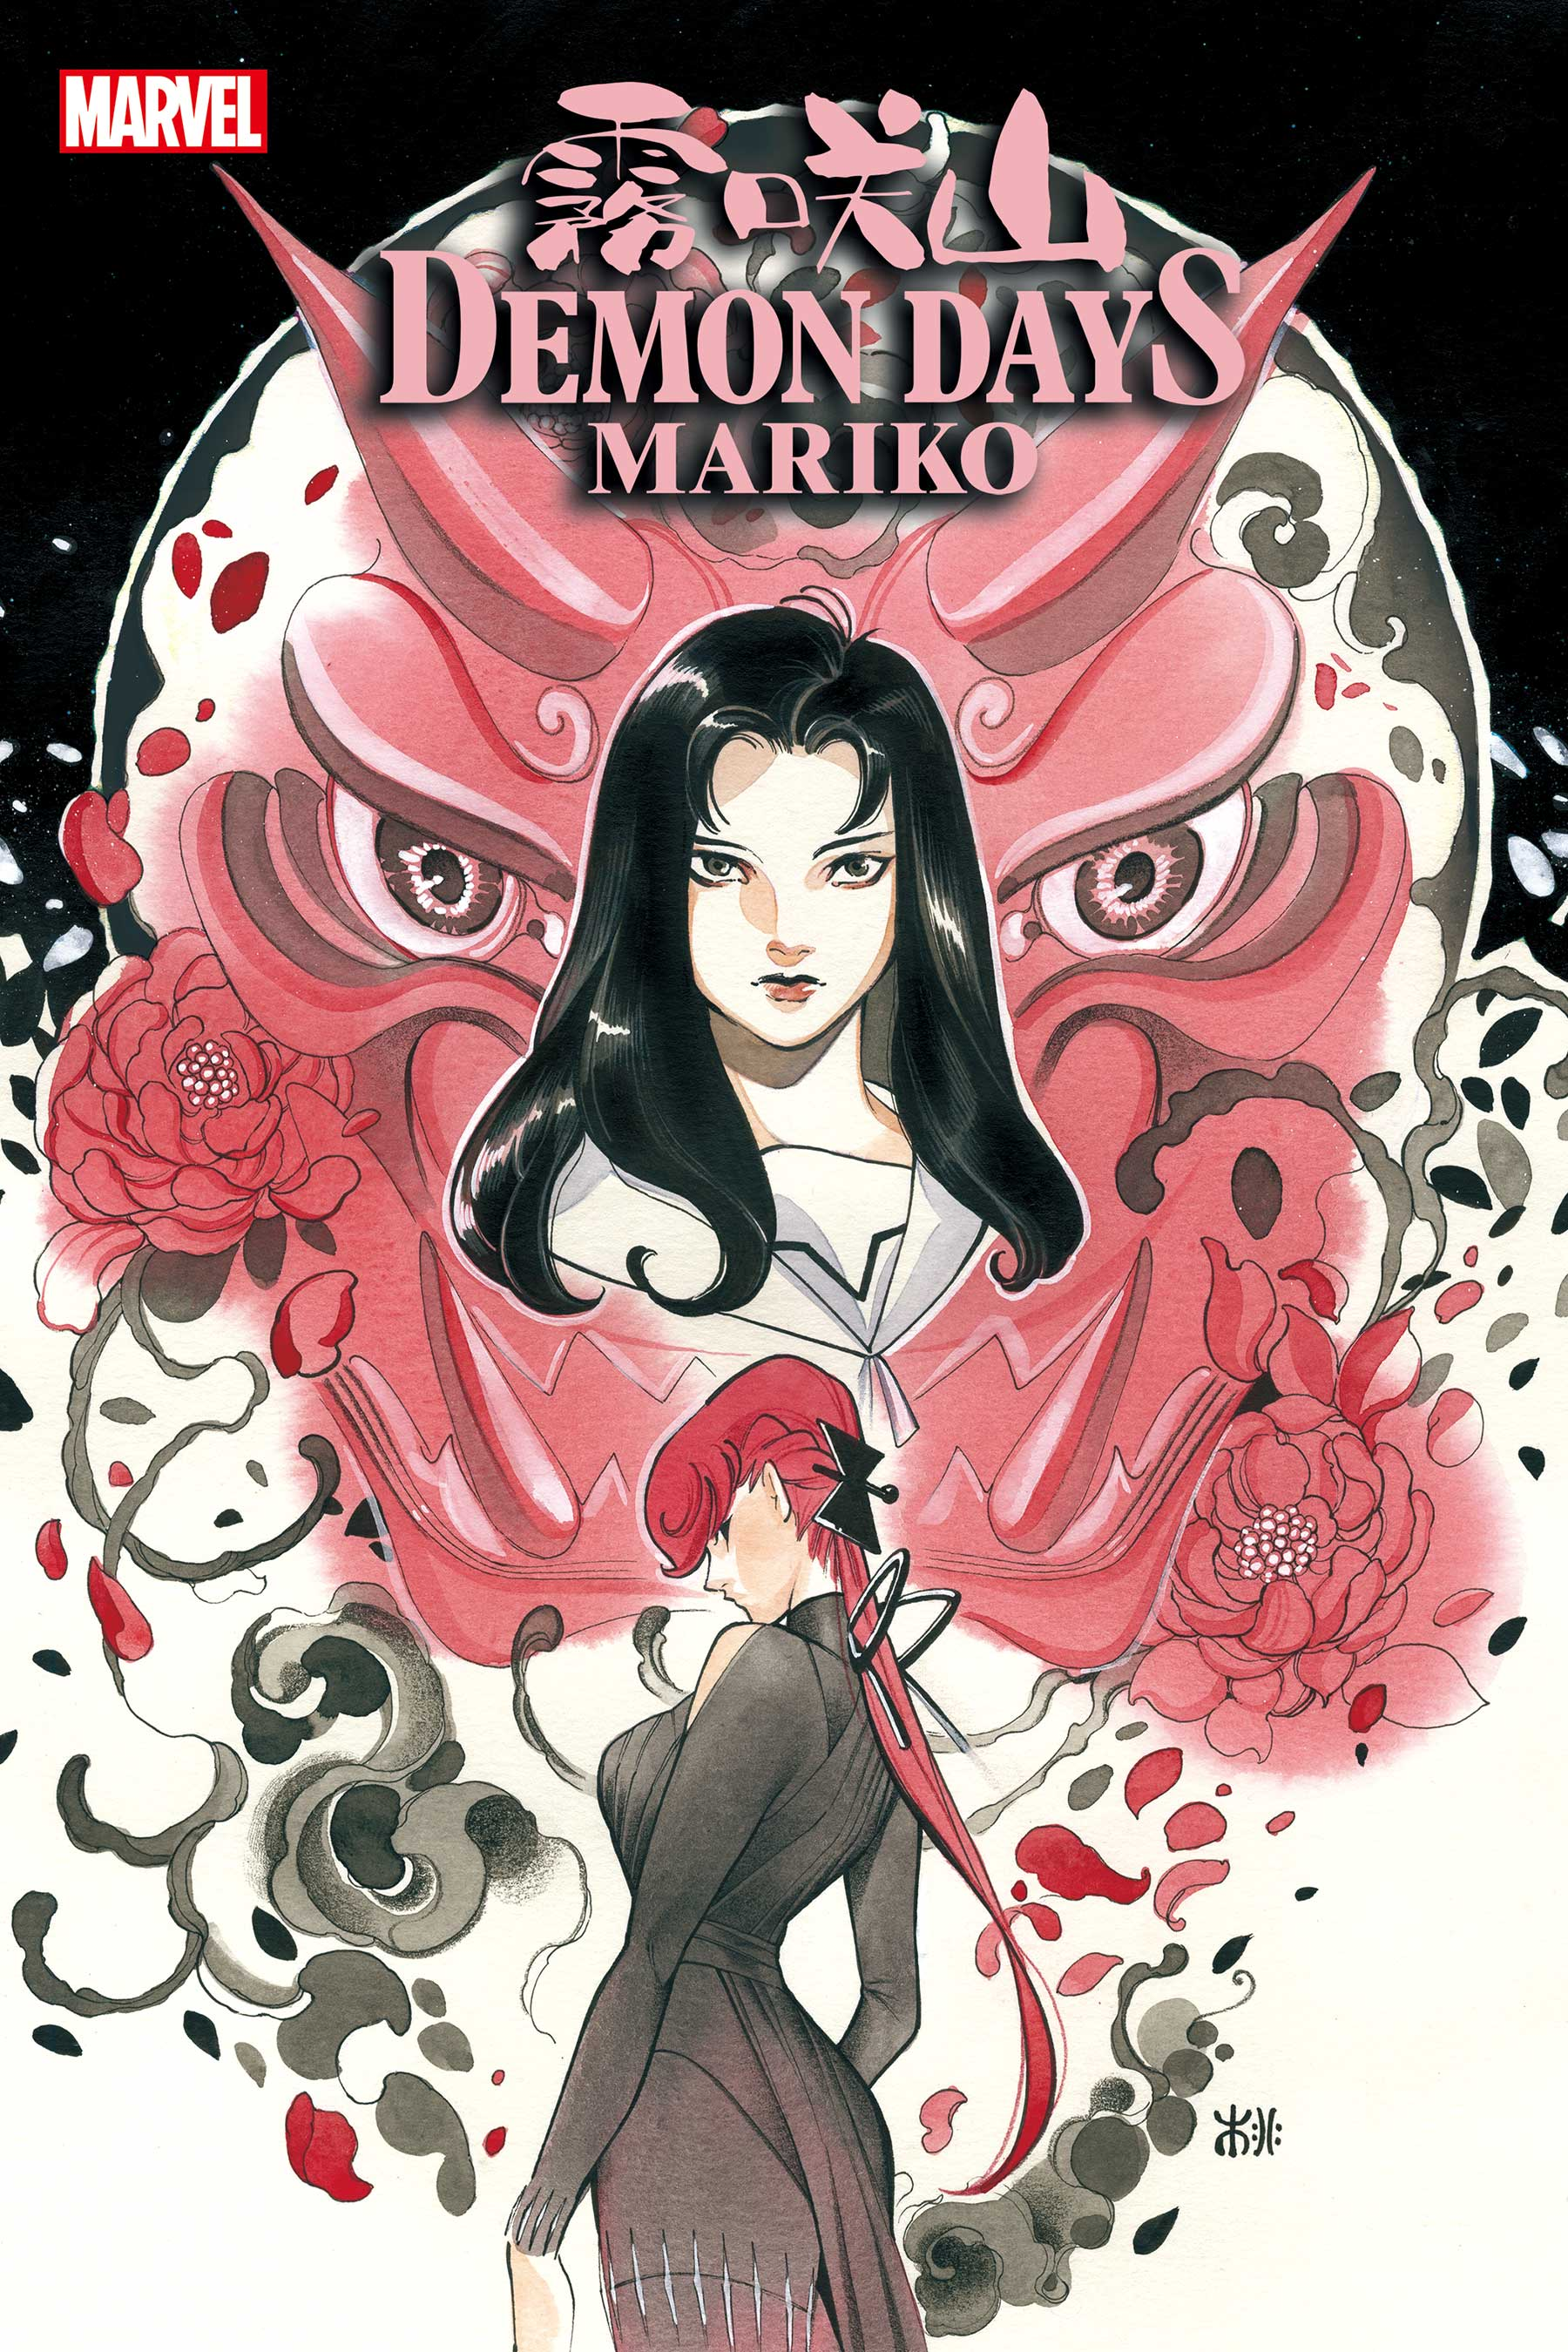 Demon Days: Mariko (2021) #1